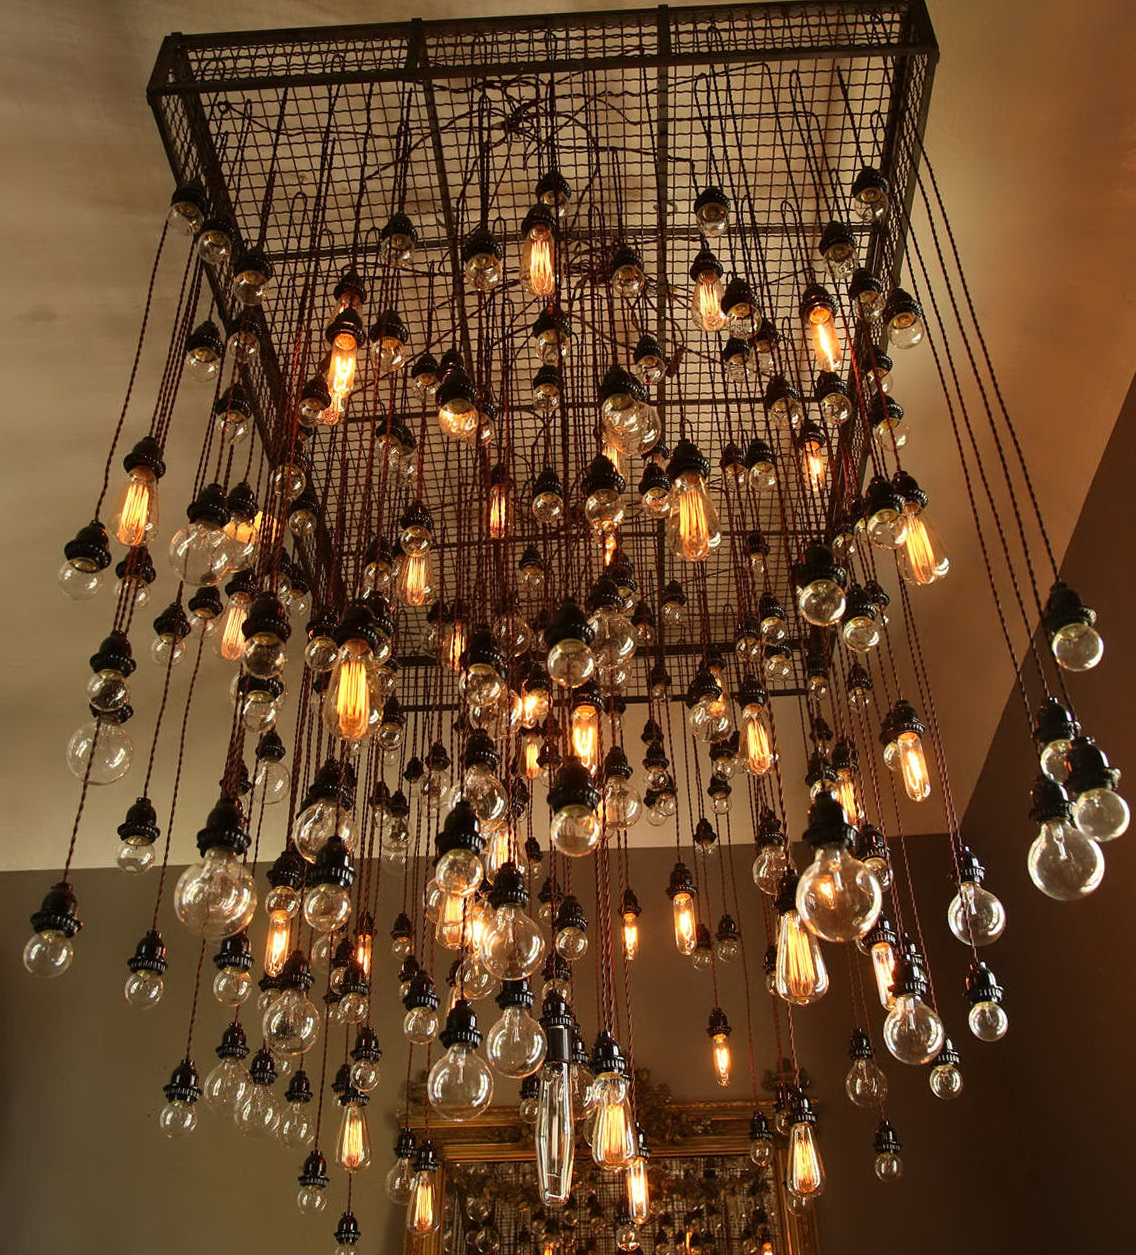 Vintage light bulb chandelier home design ideas vintage light bulb chandelier mozeypictures Image collections